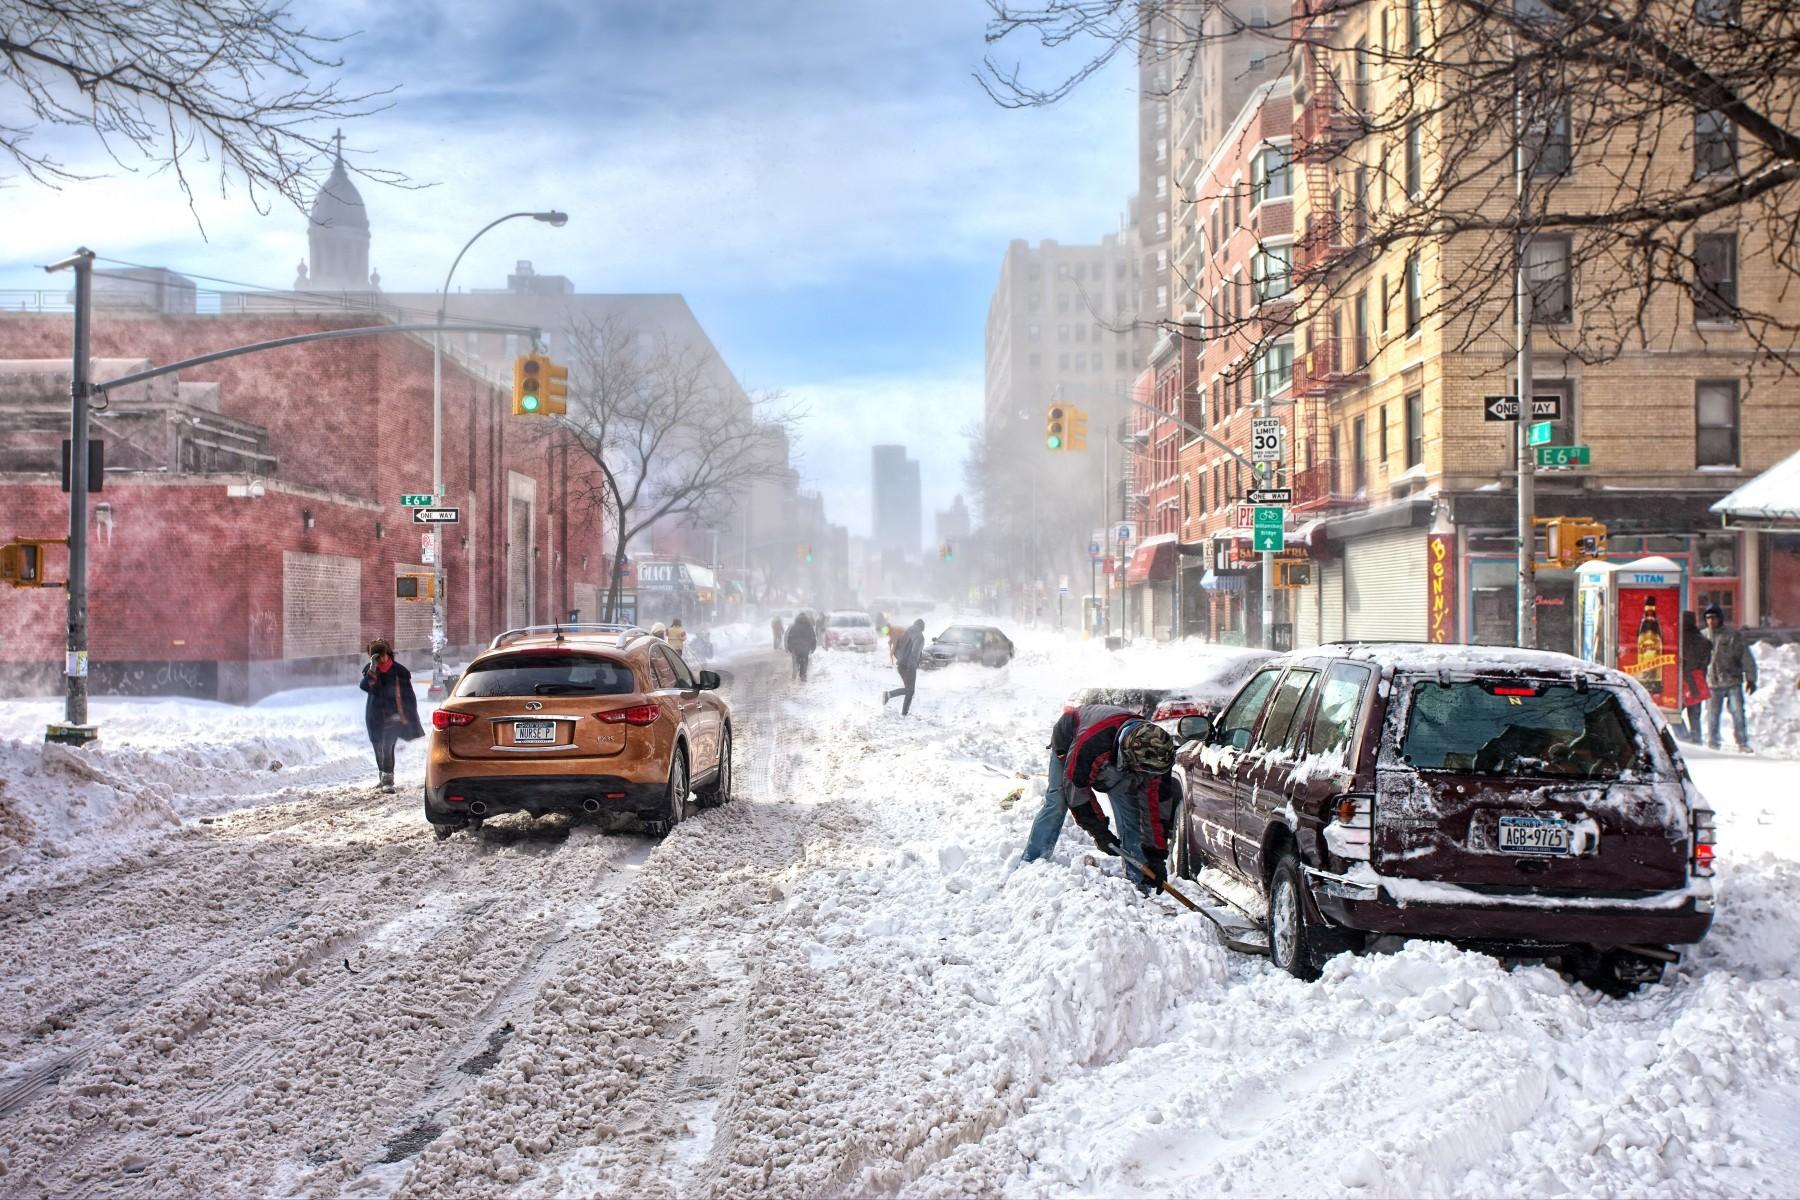 city-street-snow-winter-road-traffic-lig